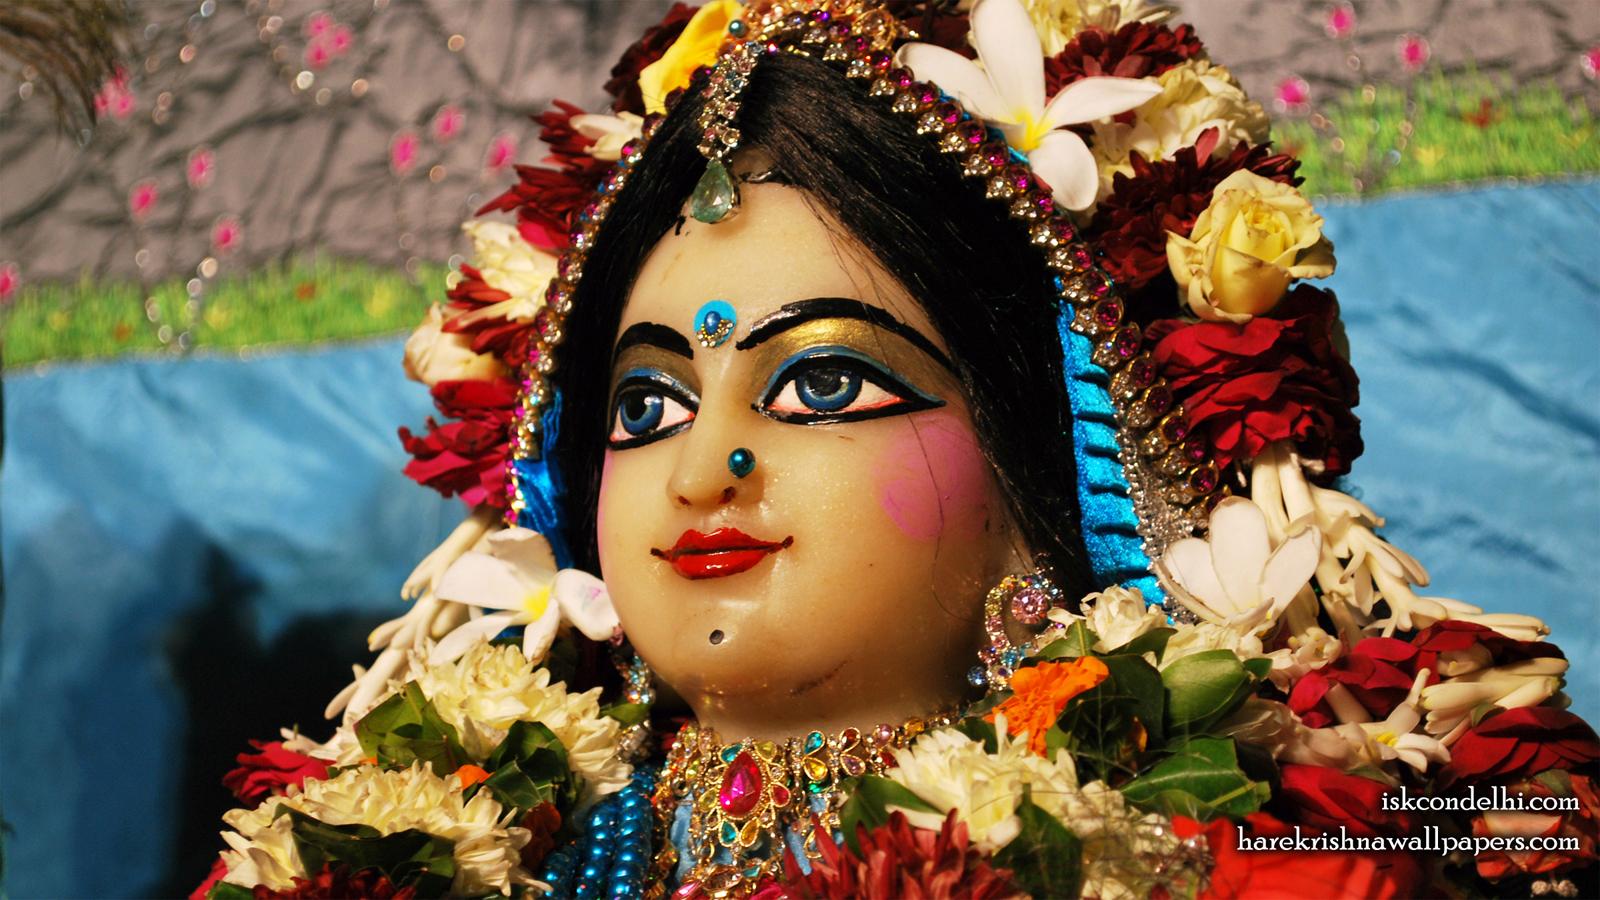 Sri Radha Close up Wallpaper (020) Size 1600x900 Download